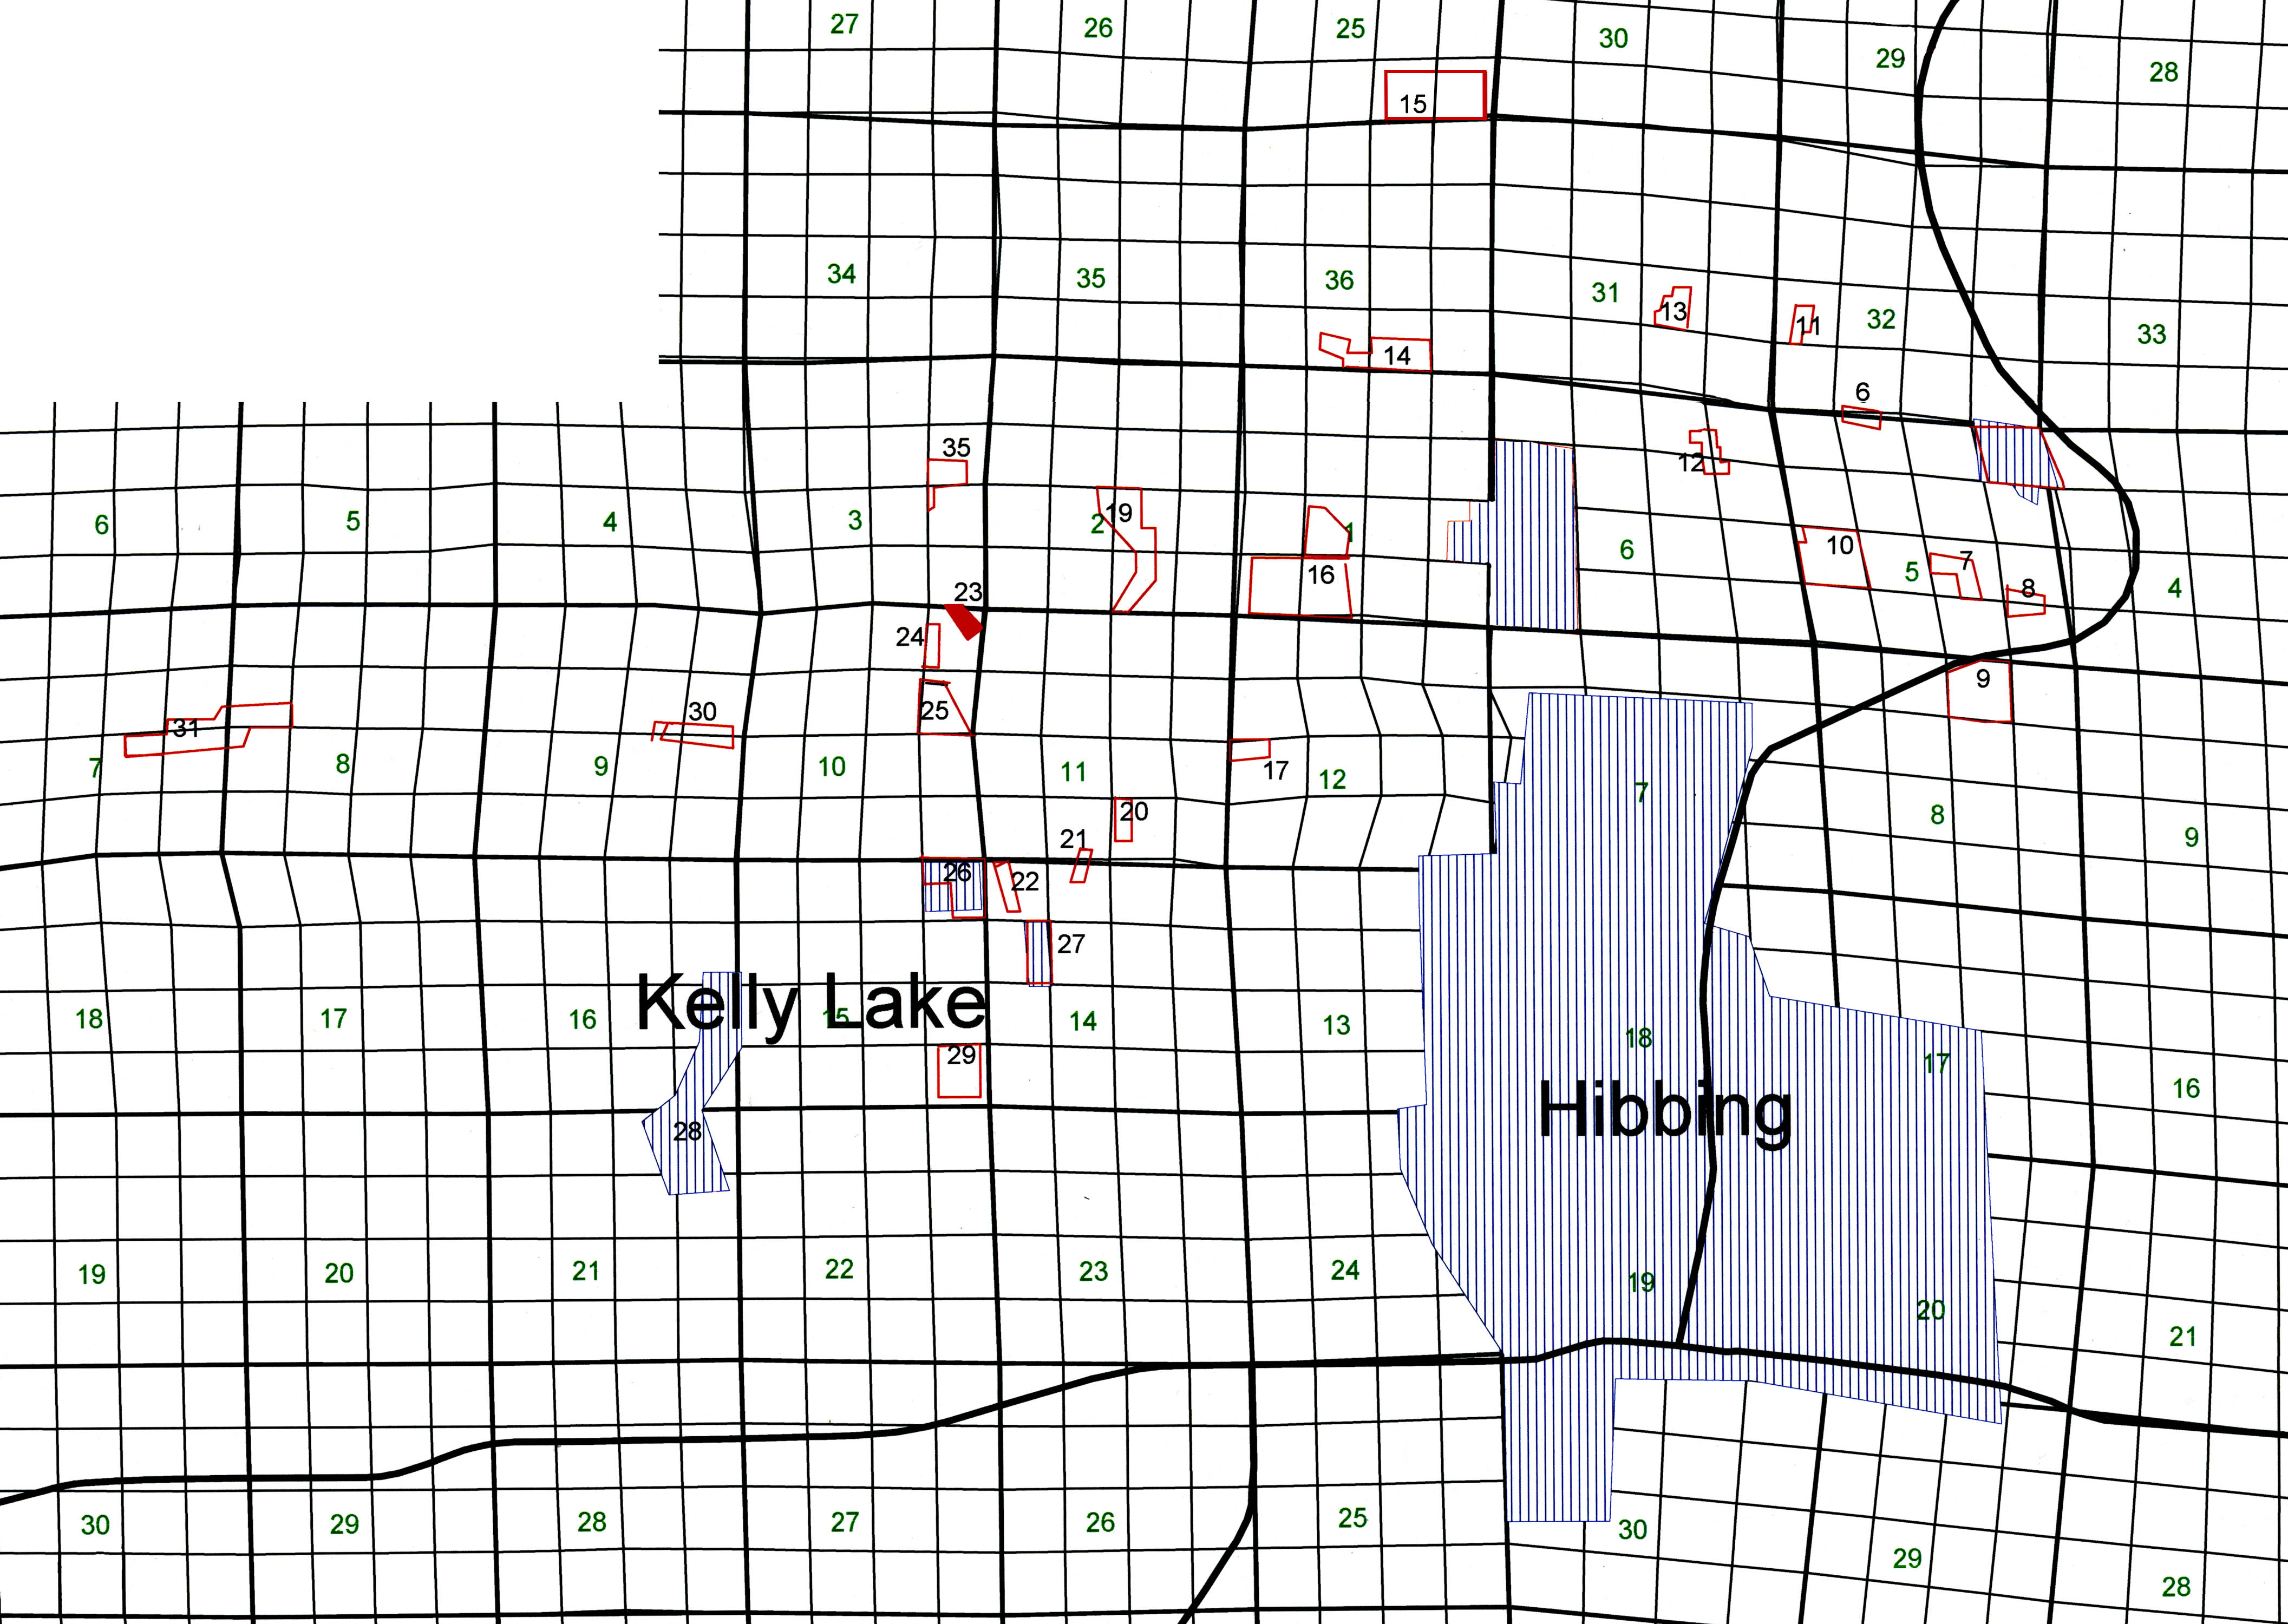 Harold (Herald) Location Image